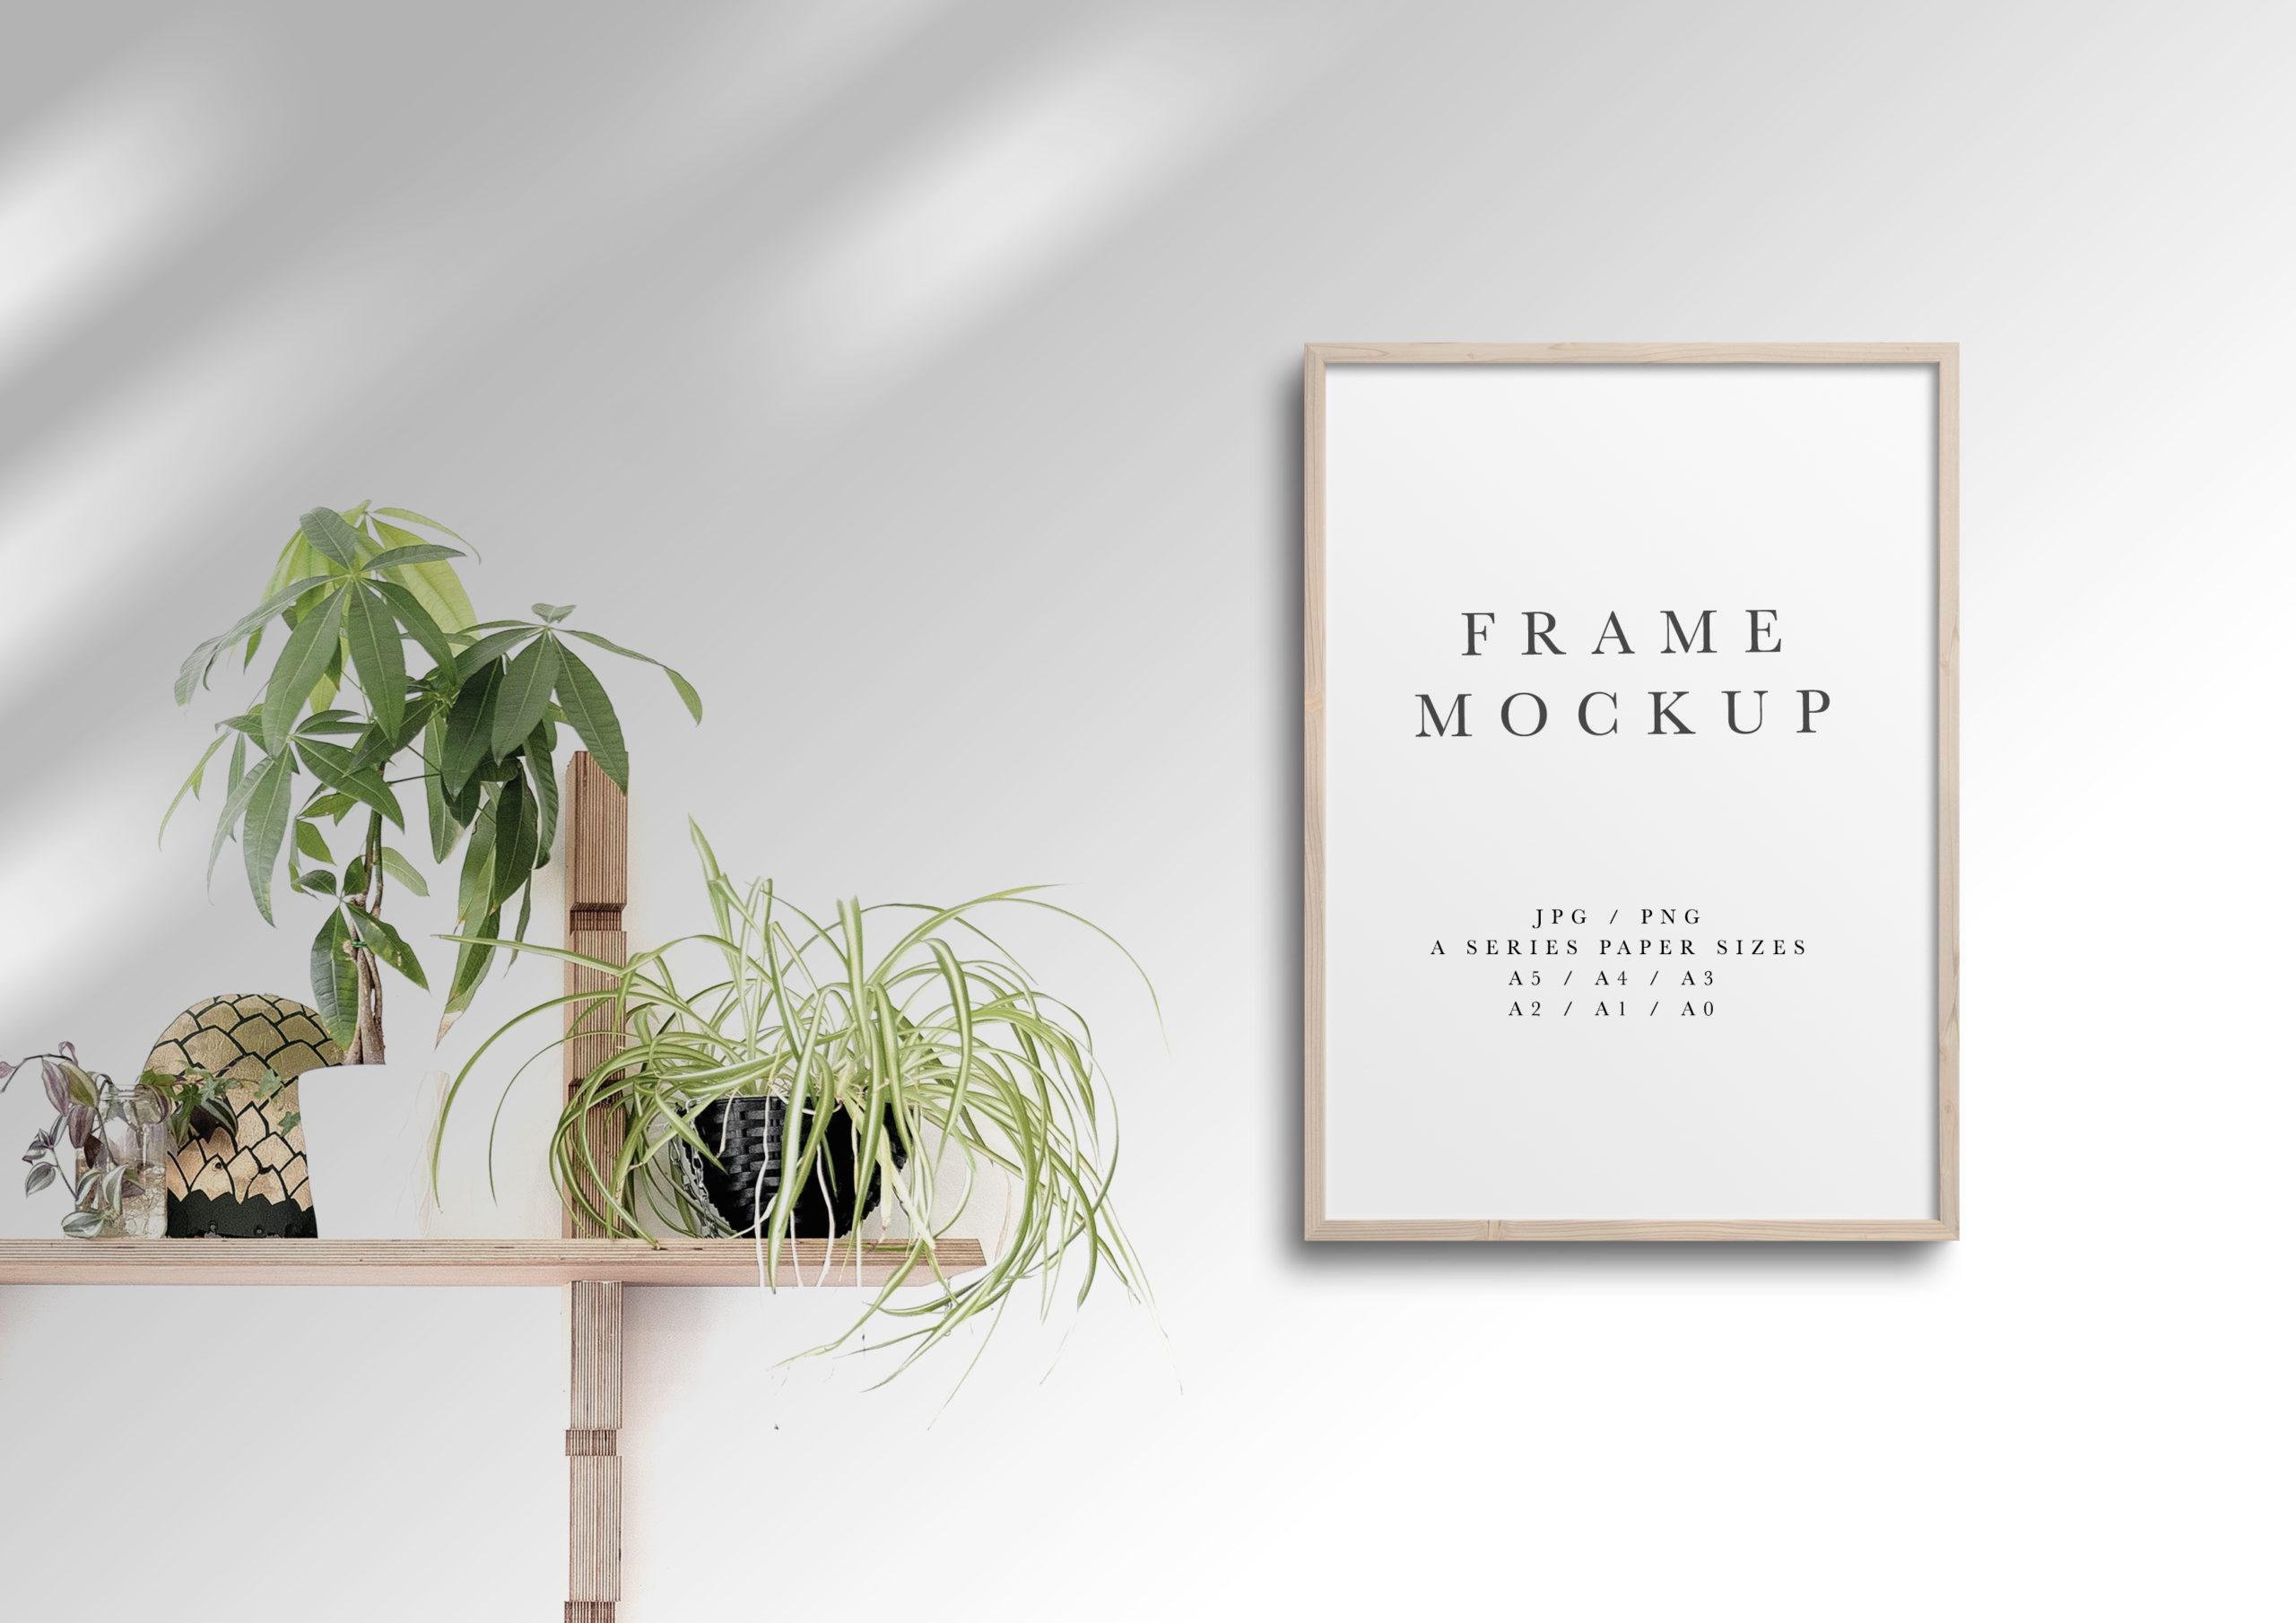 Natural Oak Wood Matted Frame on White Wall Background DIGITAL FILE DOWNLOAD A6 Digital Frame Mockup Styled Photography Mockup